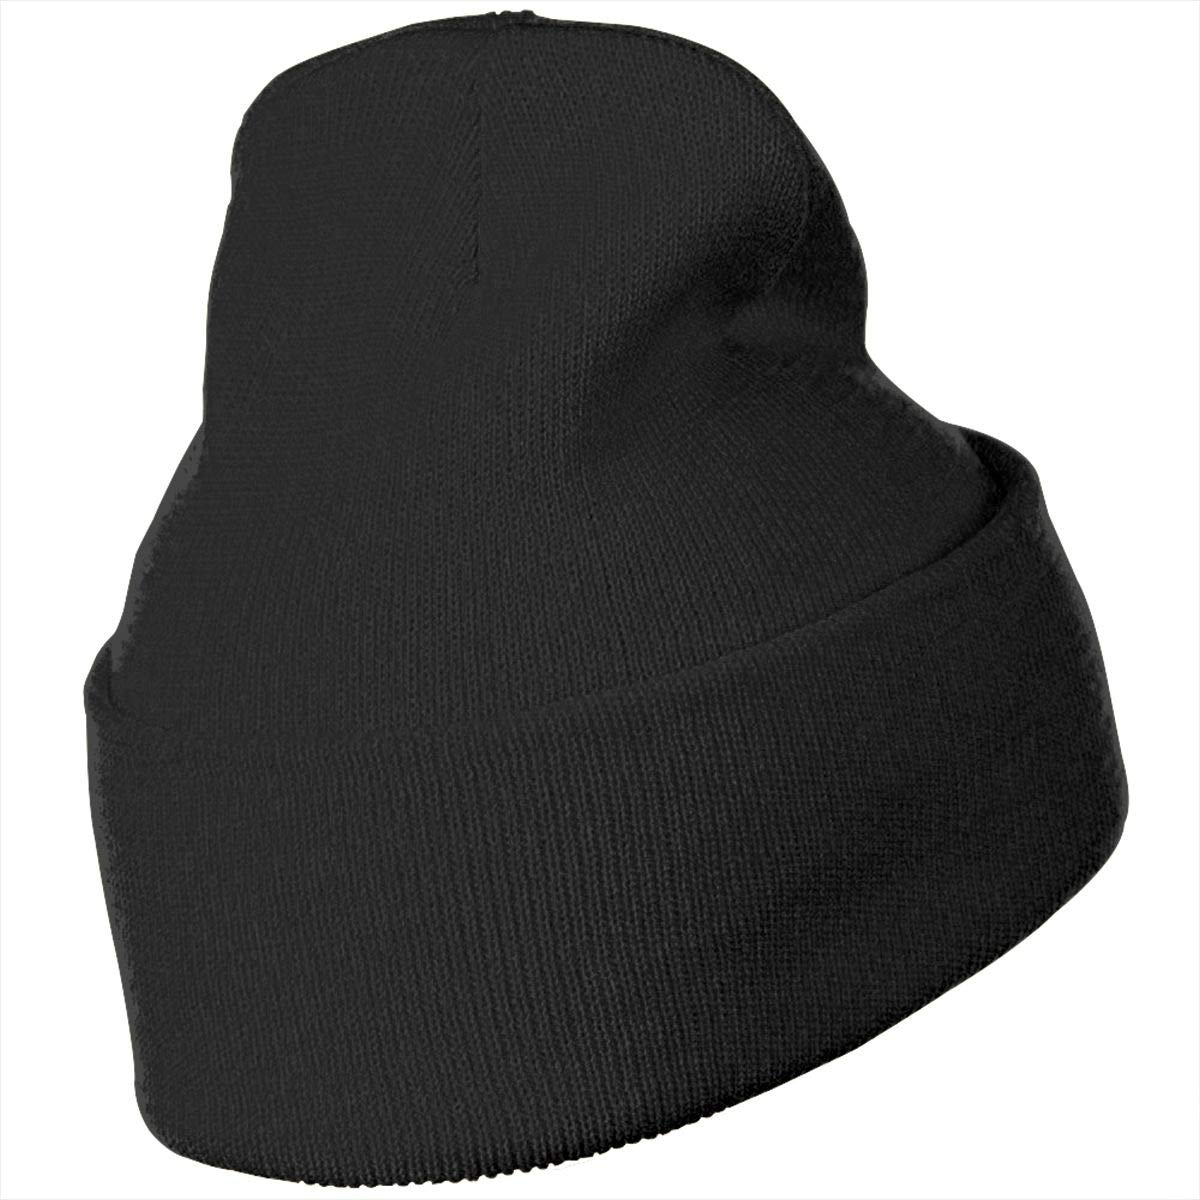 3795f284305 Amazon.com  LixuA Metallica Logo Unisex Warm Winter Hat Knit Beanie Skull  Cap Cuff Beanie Hat Winter Hats  Sports   Outdoors